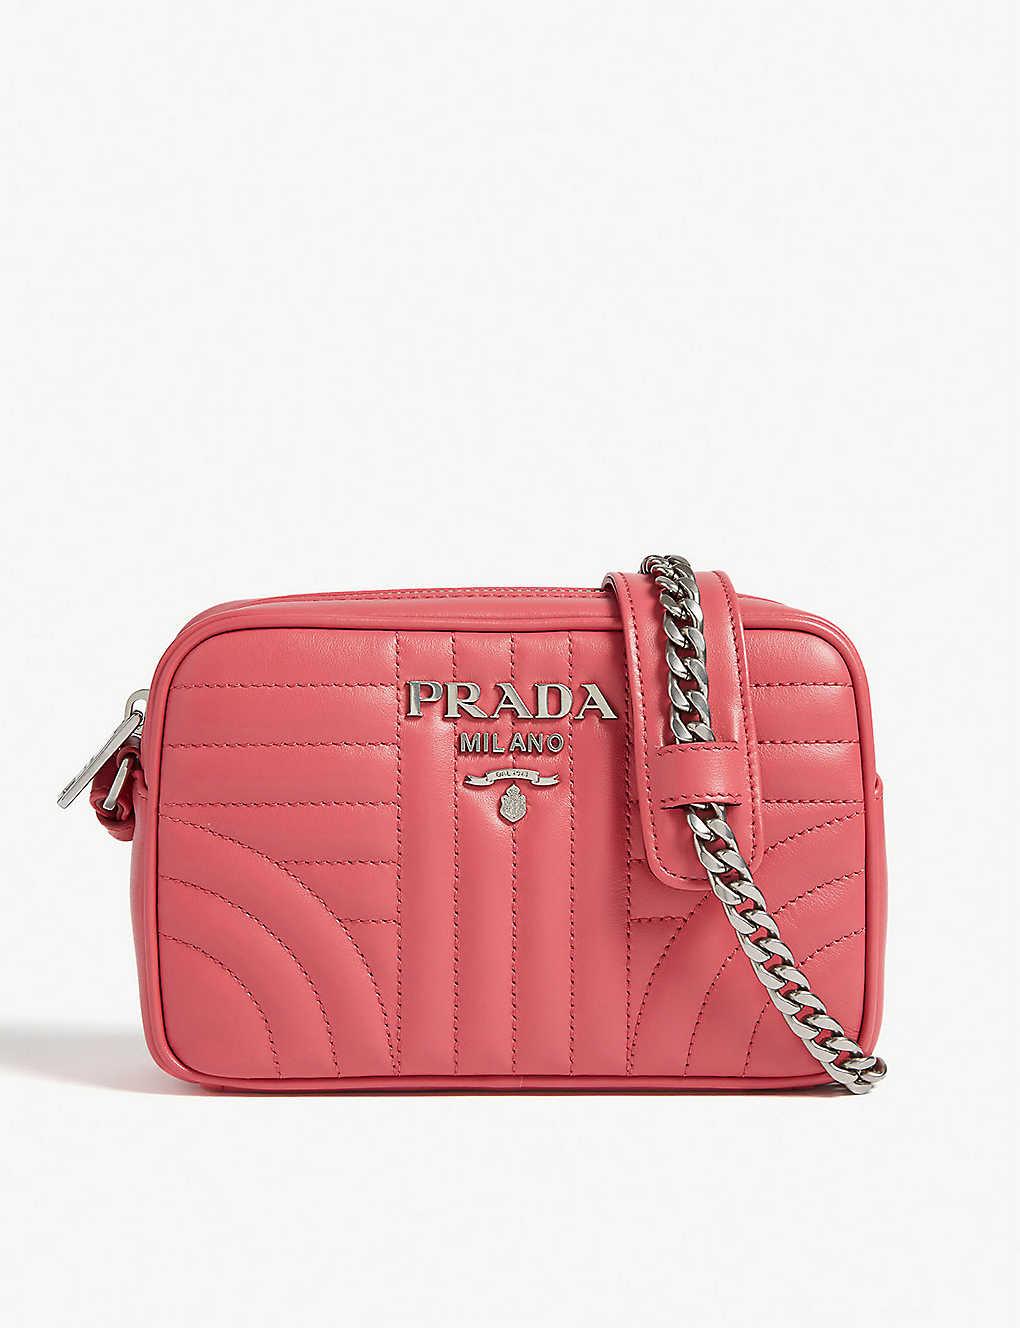 83c9c7185648 Diagramme camera bag - Peonie pink ...